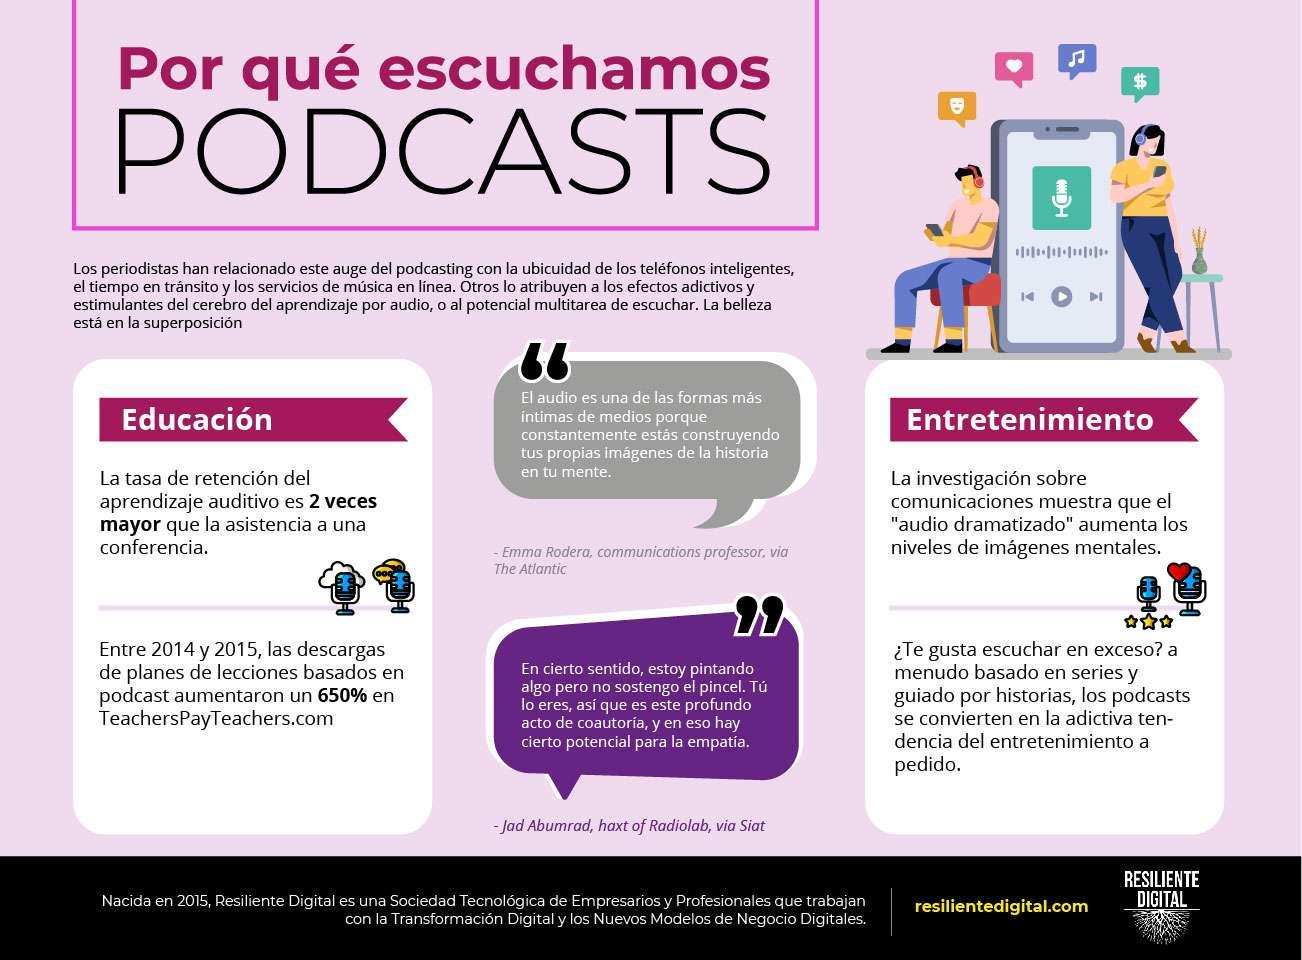 por qué escuchamos podcasts